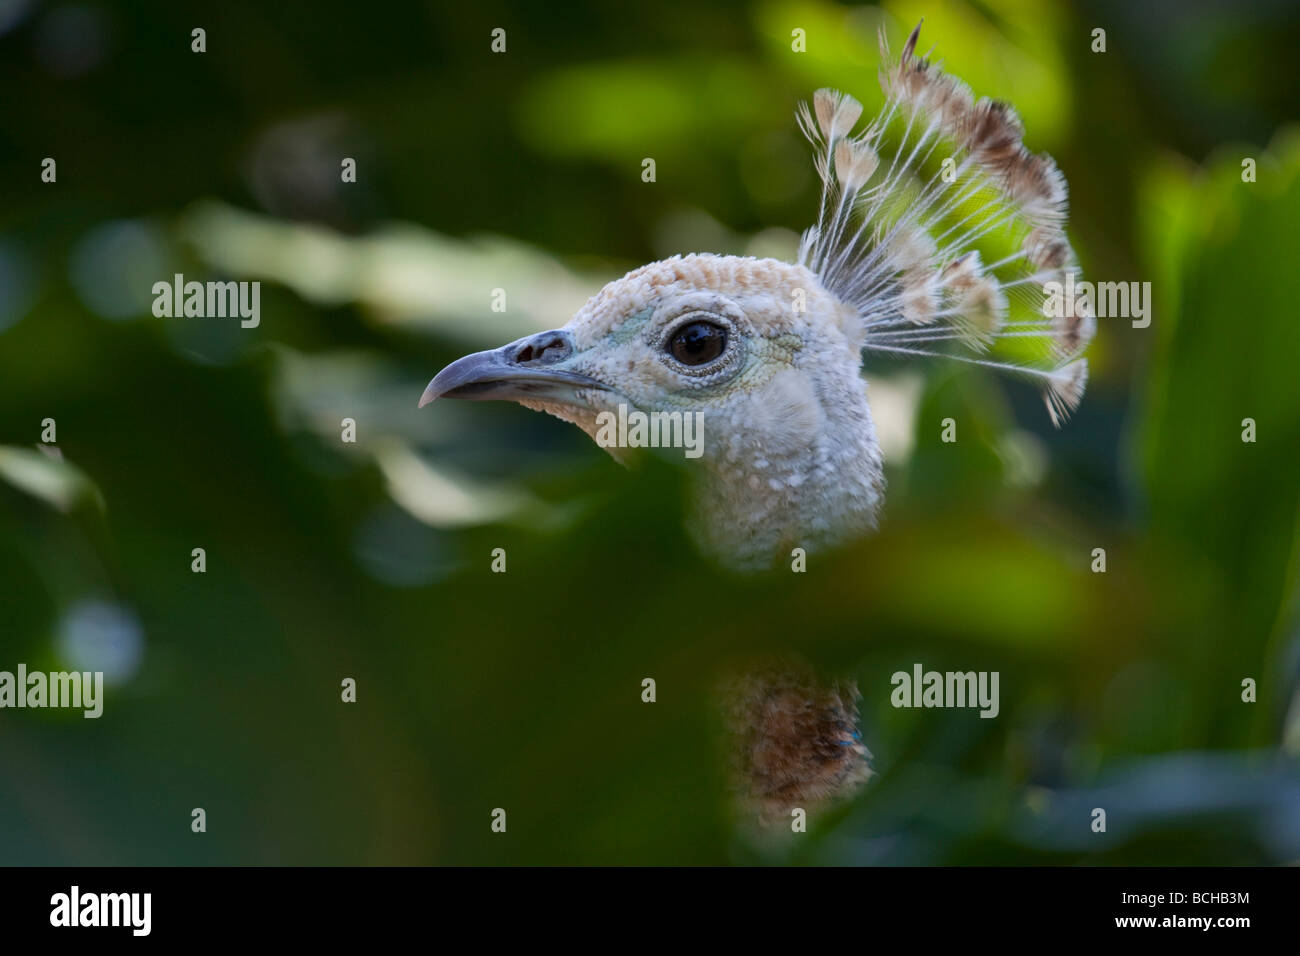 Head shot of Indian Blue peahen through foilage. Genus Pavo, pheasant family, Phasianidae, species Indian Peafowl. - Stock Image